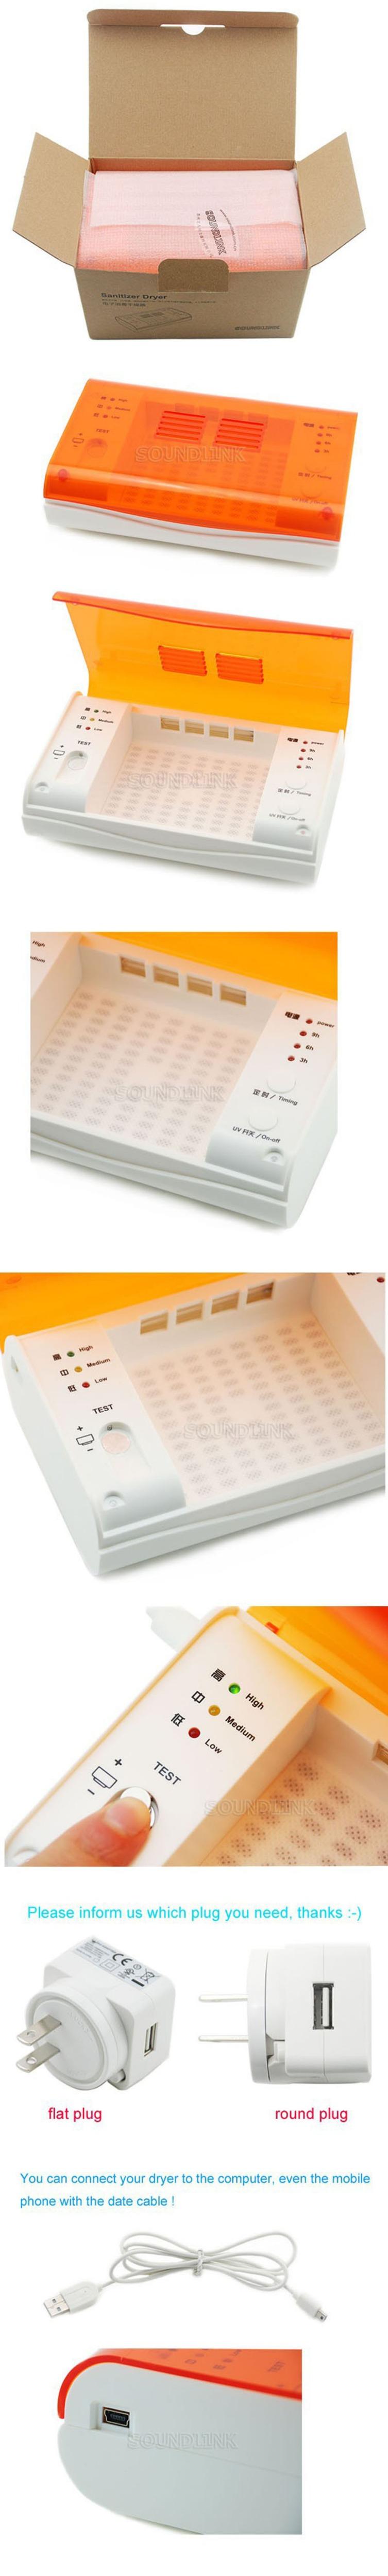 UV Sanitizer Dehumidifier